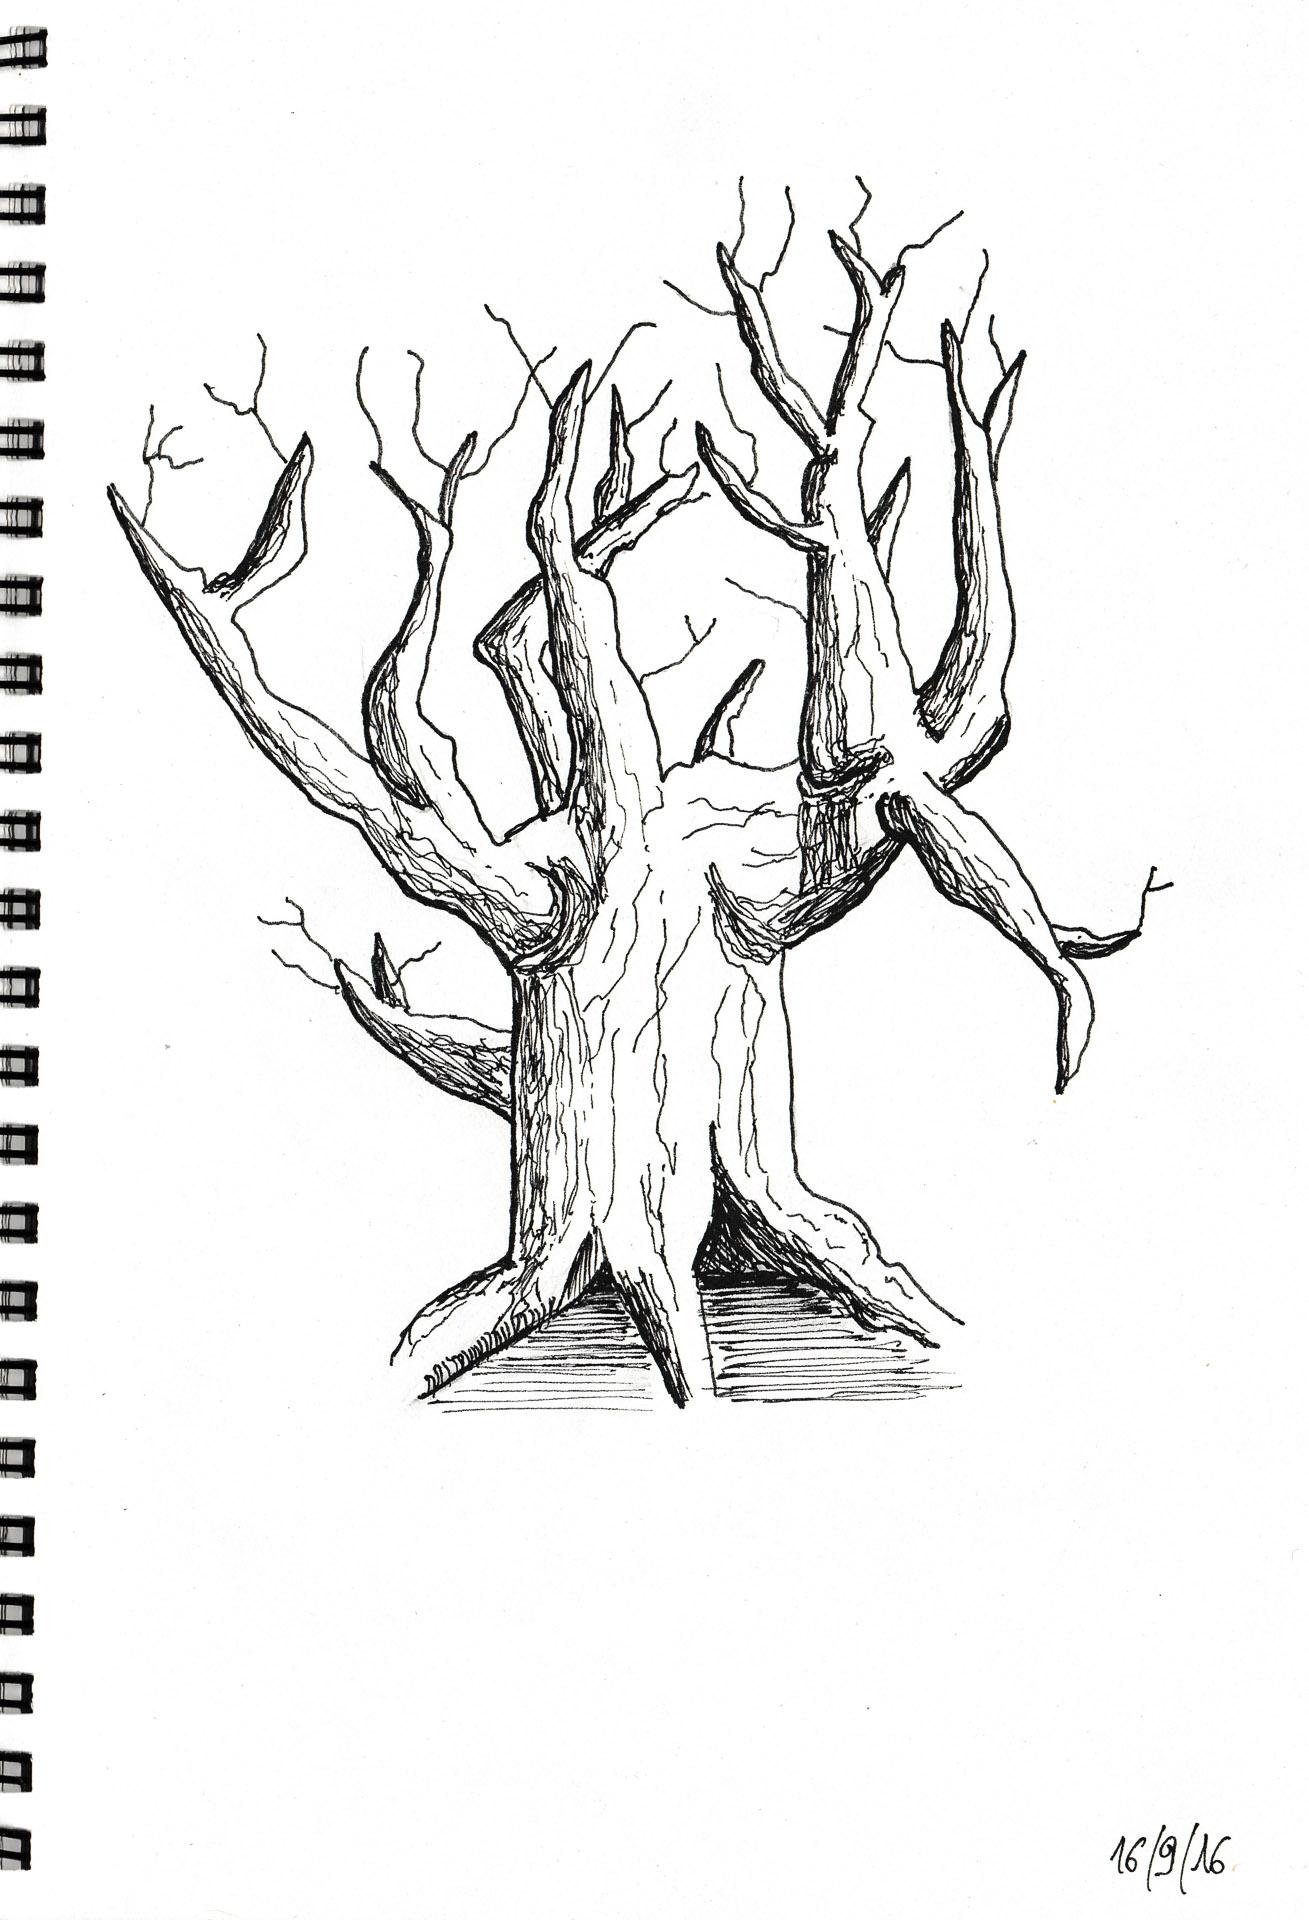 dessin-pied-32